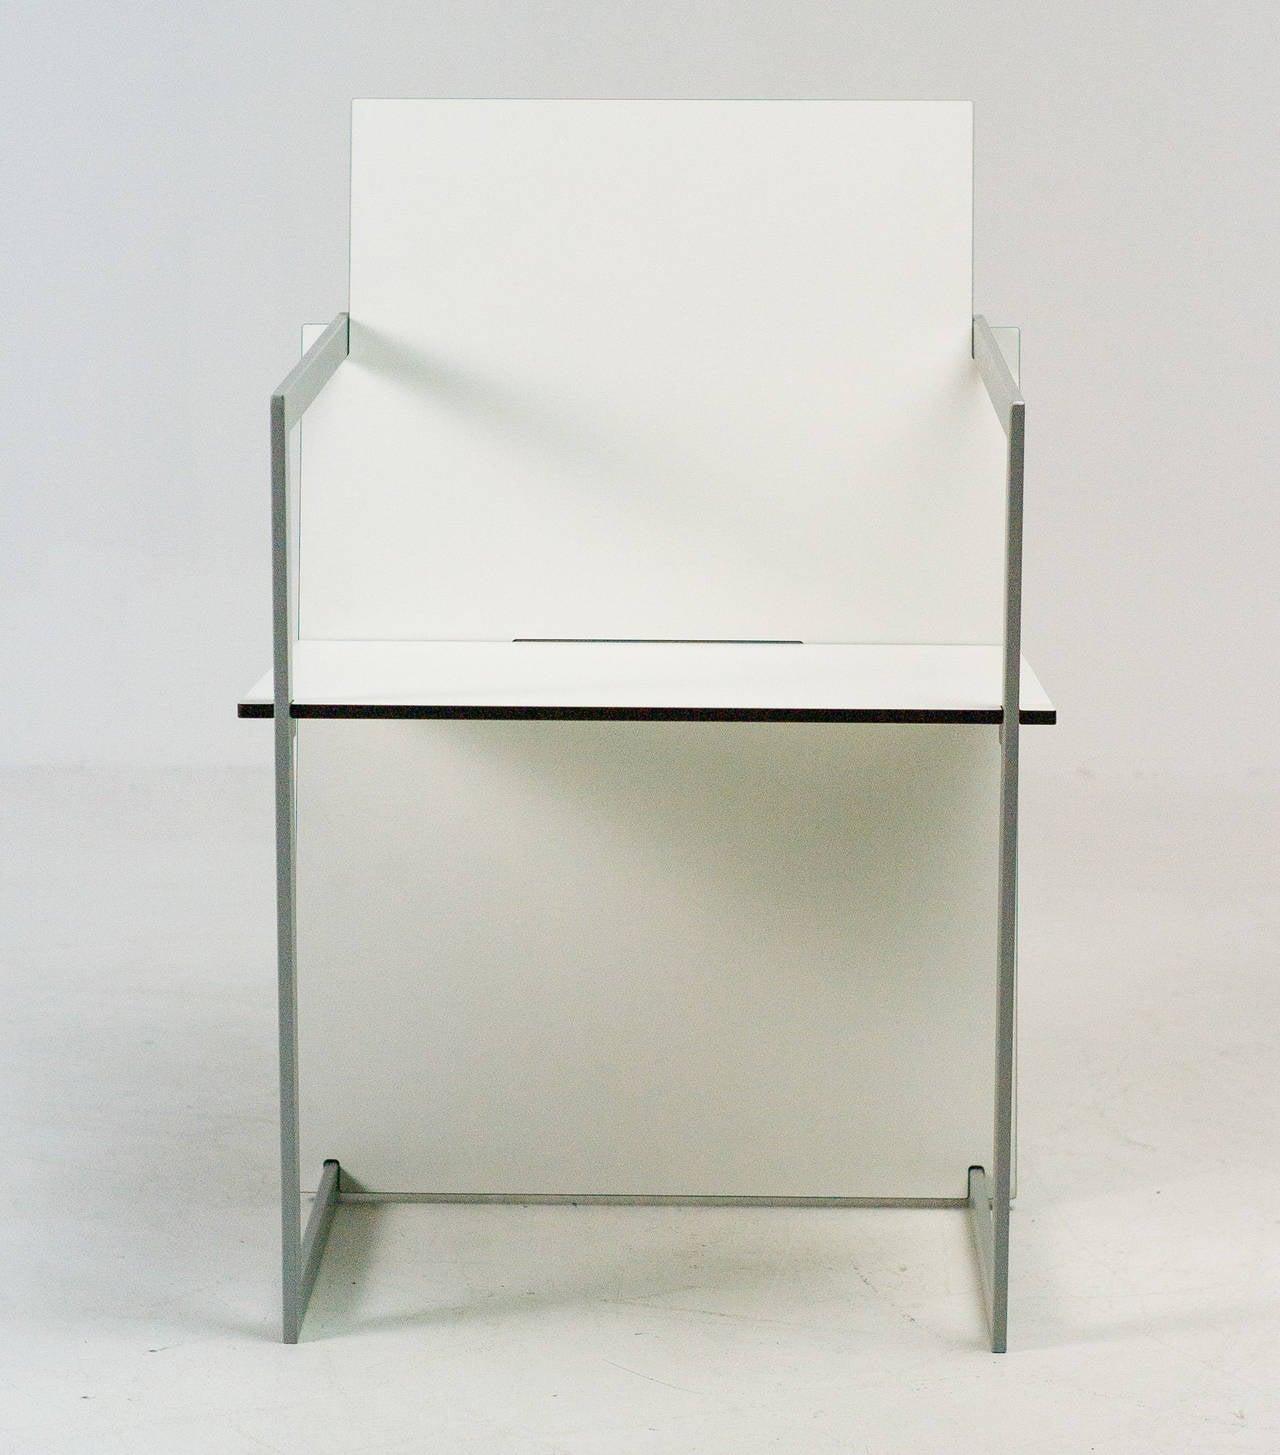 Dutch design spectro chairs by lourens fischer at 1stdibs for Dutch design chair karton